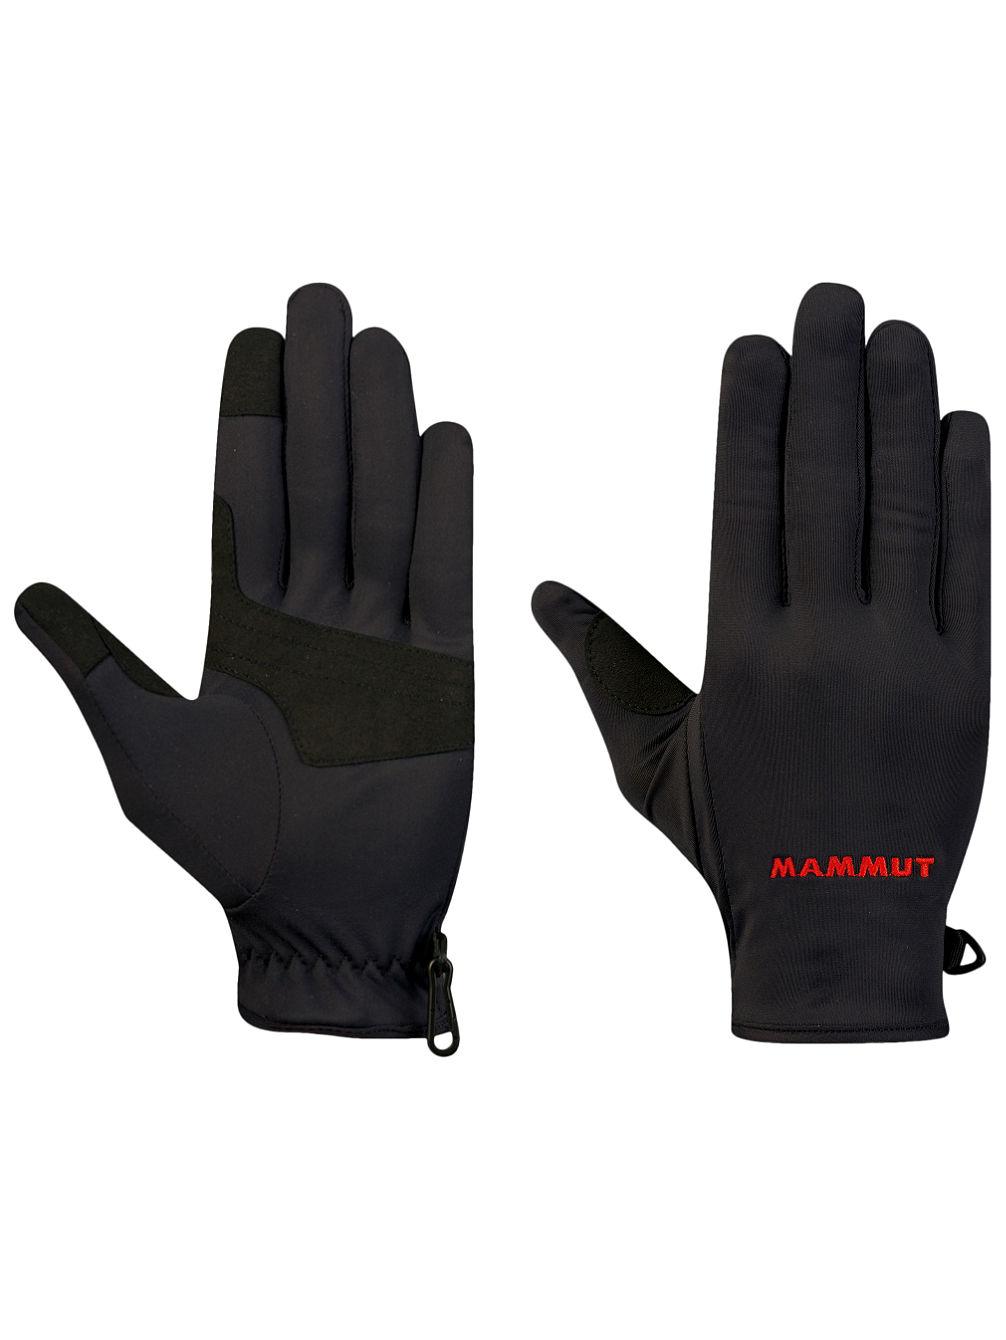 mammut-explore-gloves